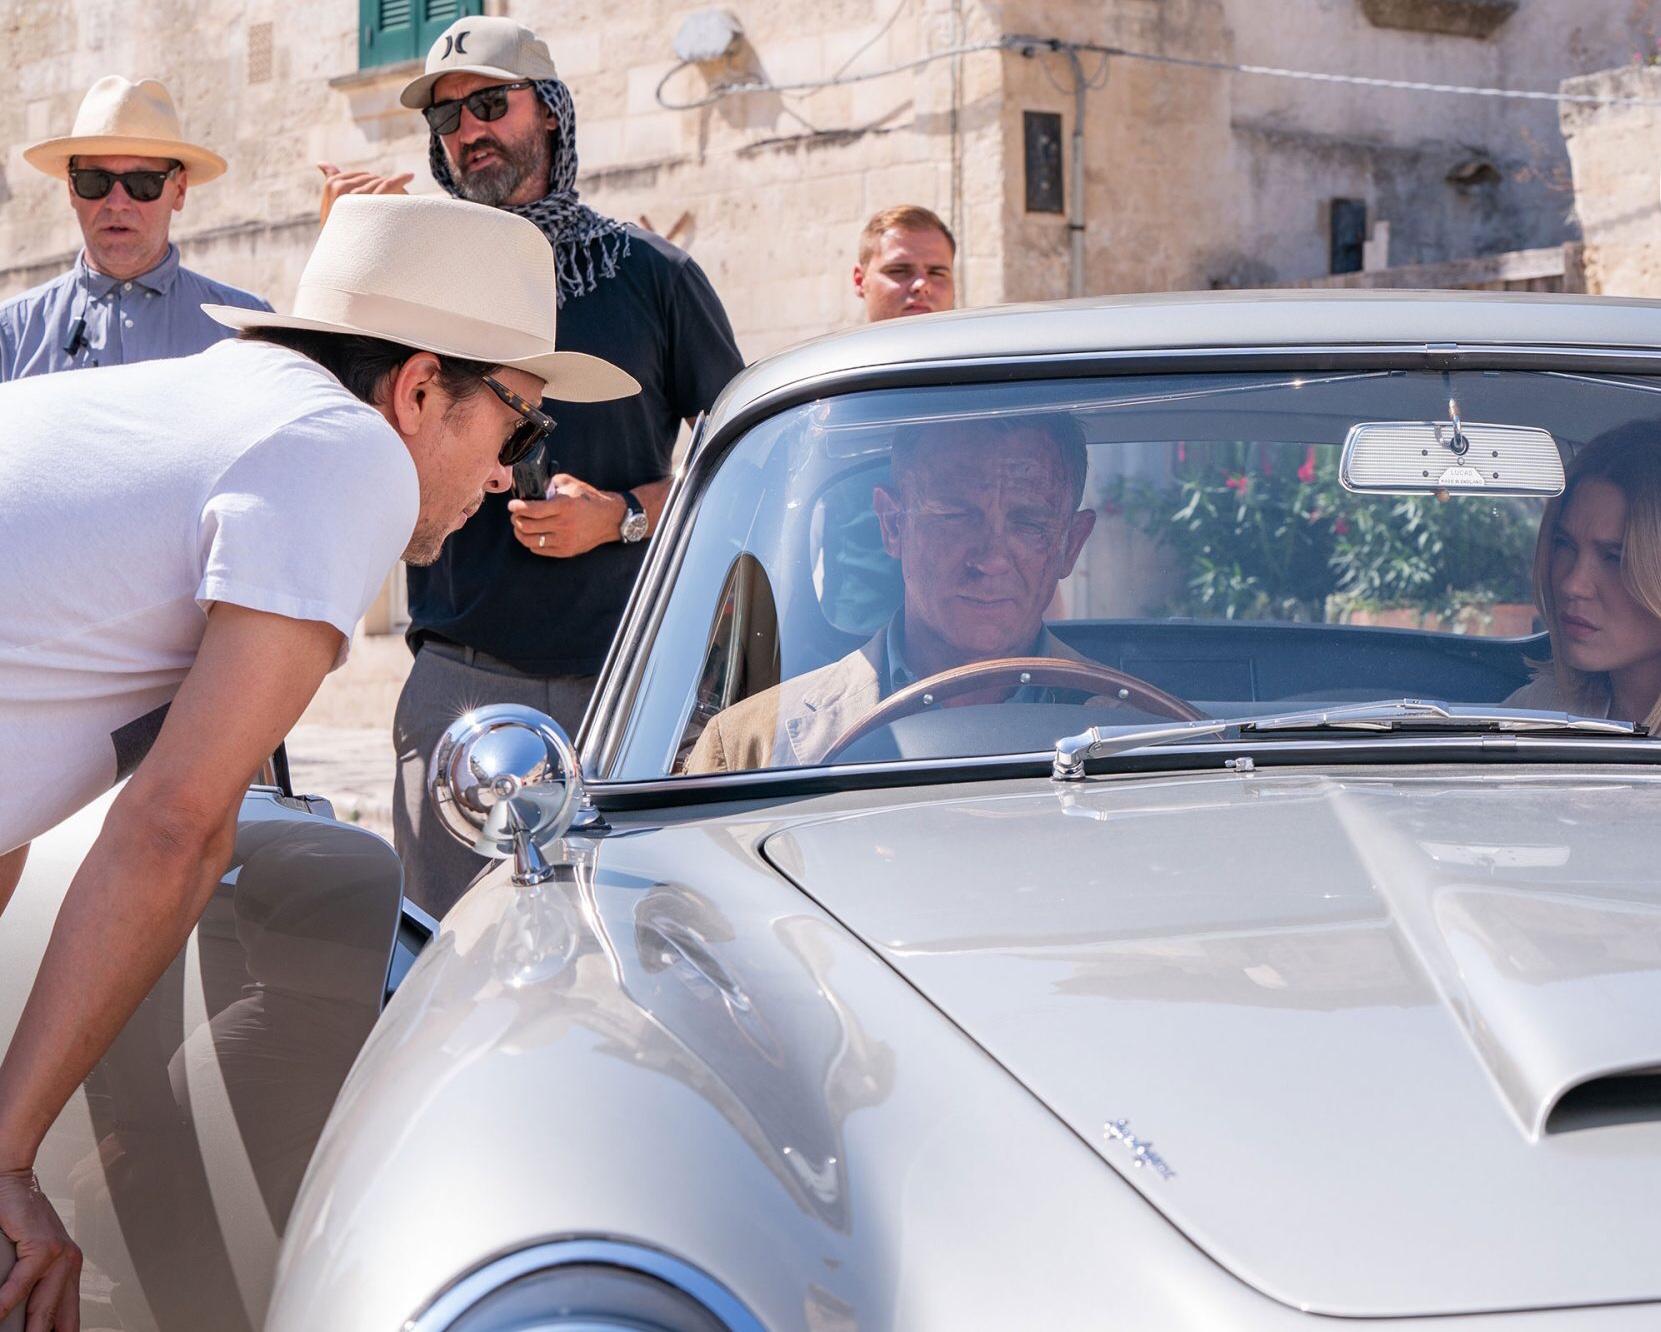 Daniel Craig, Cary Joji Fukunaga, and Léa Seydoux in No Time to Die (2021)